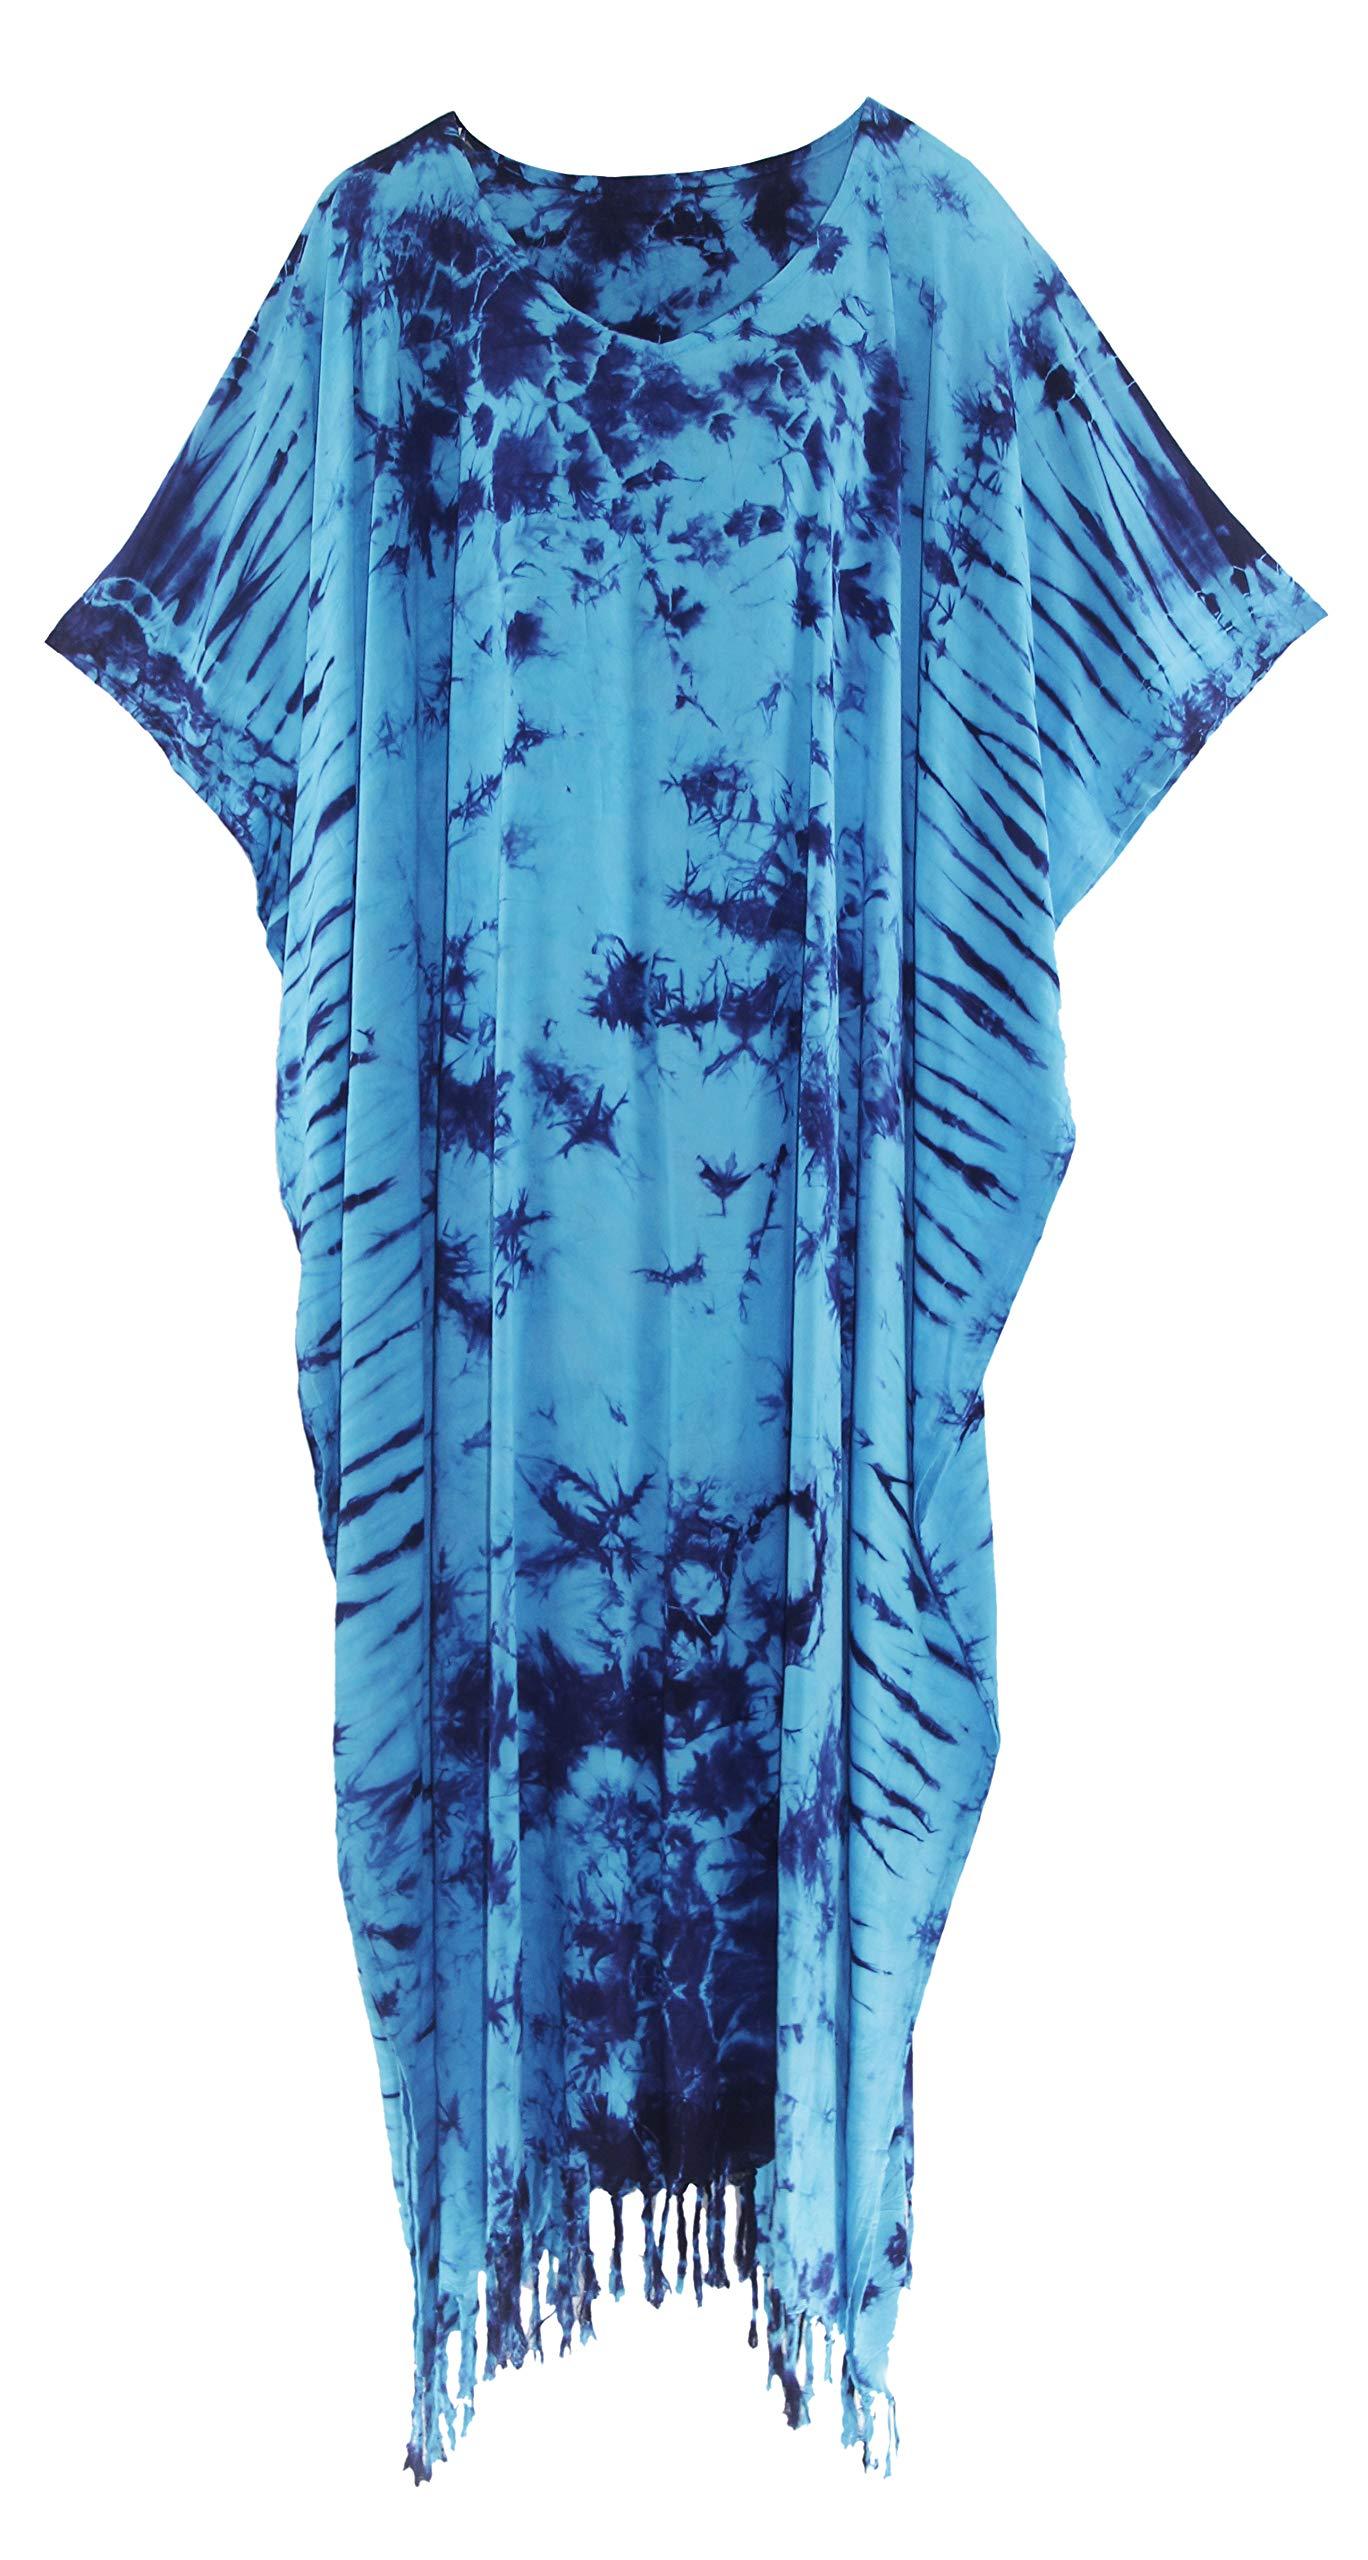 Available at Amazon: Beautybatik Women Hippie Tie Dye Caftan Kaftan Loungewear Maxi Plus Size Long Dress